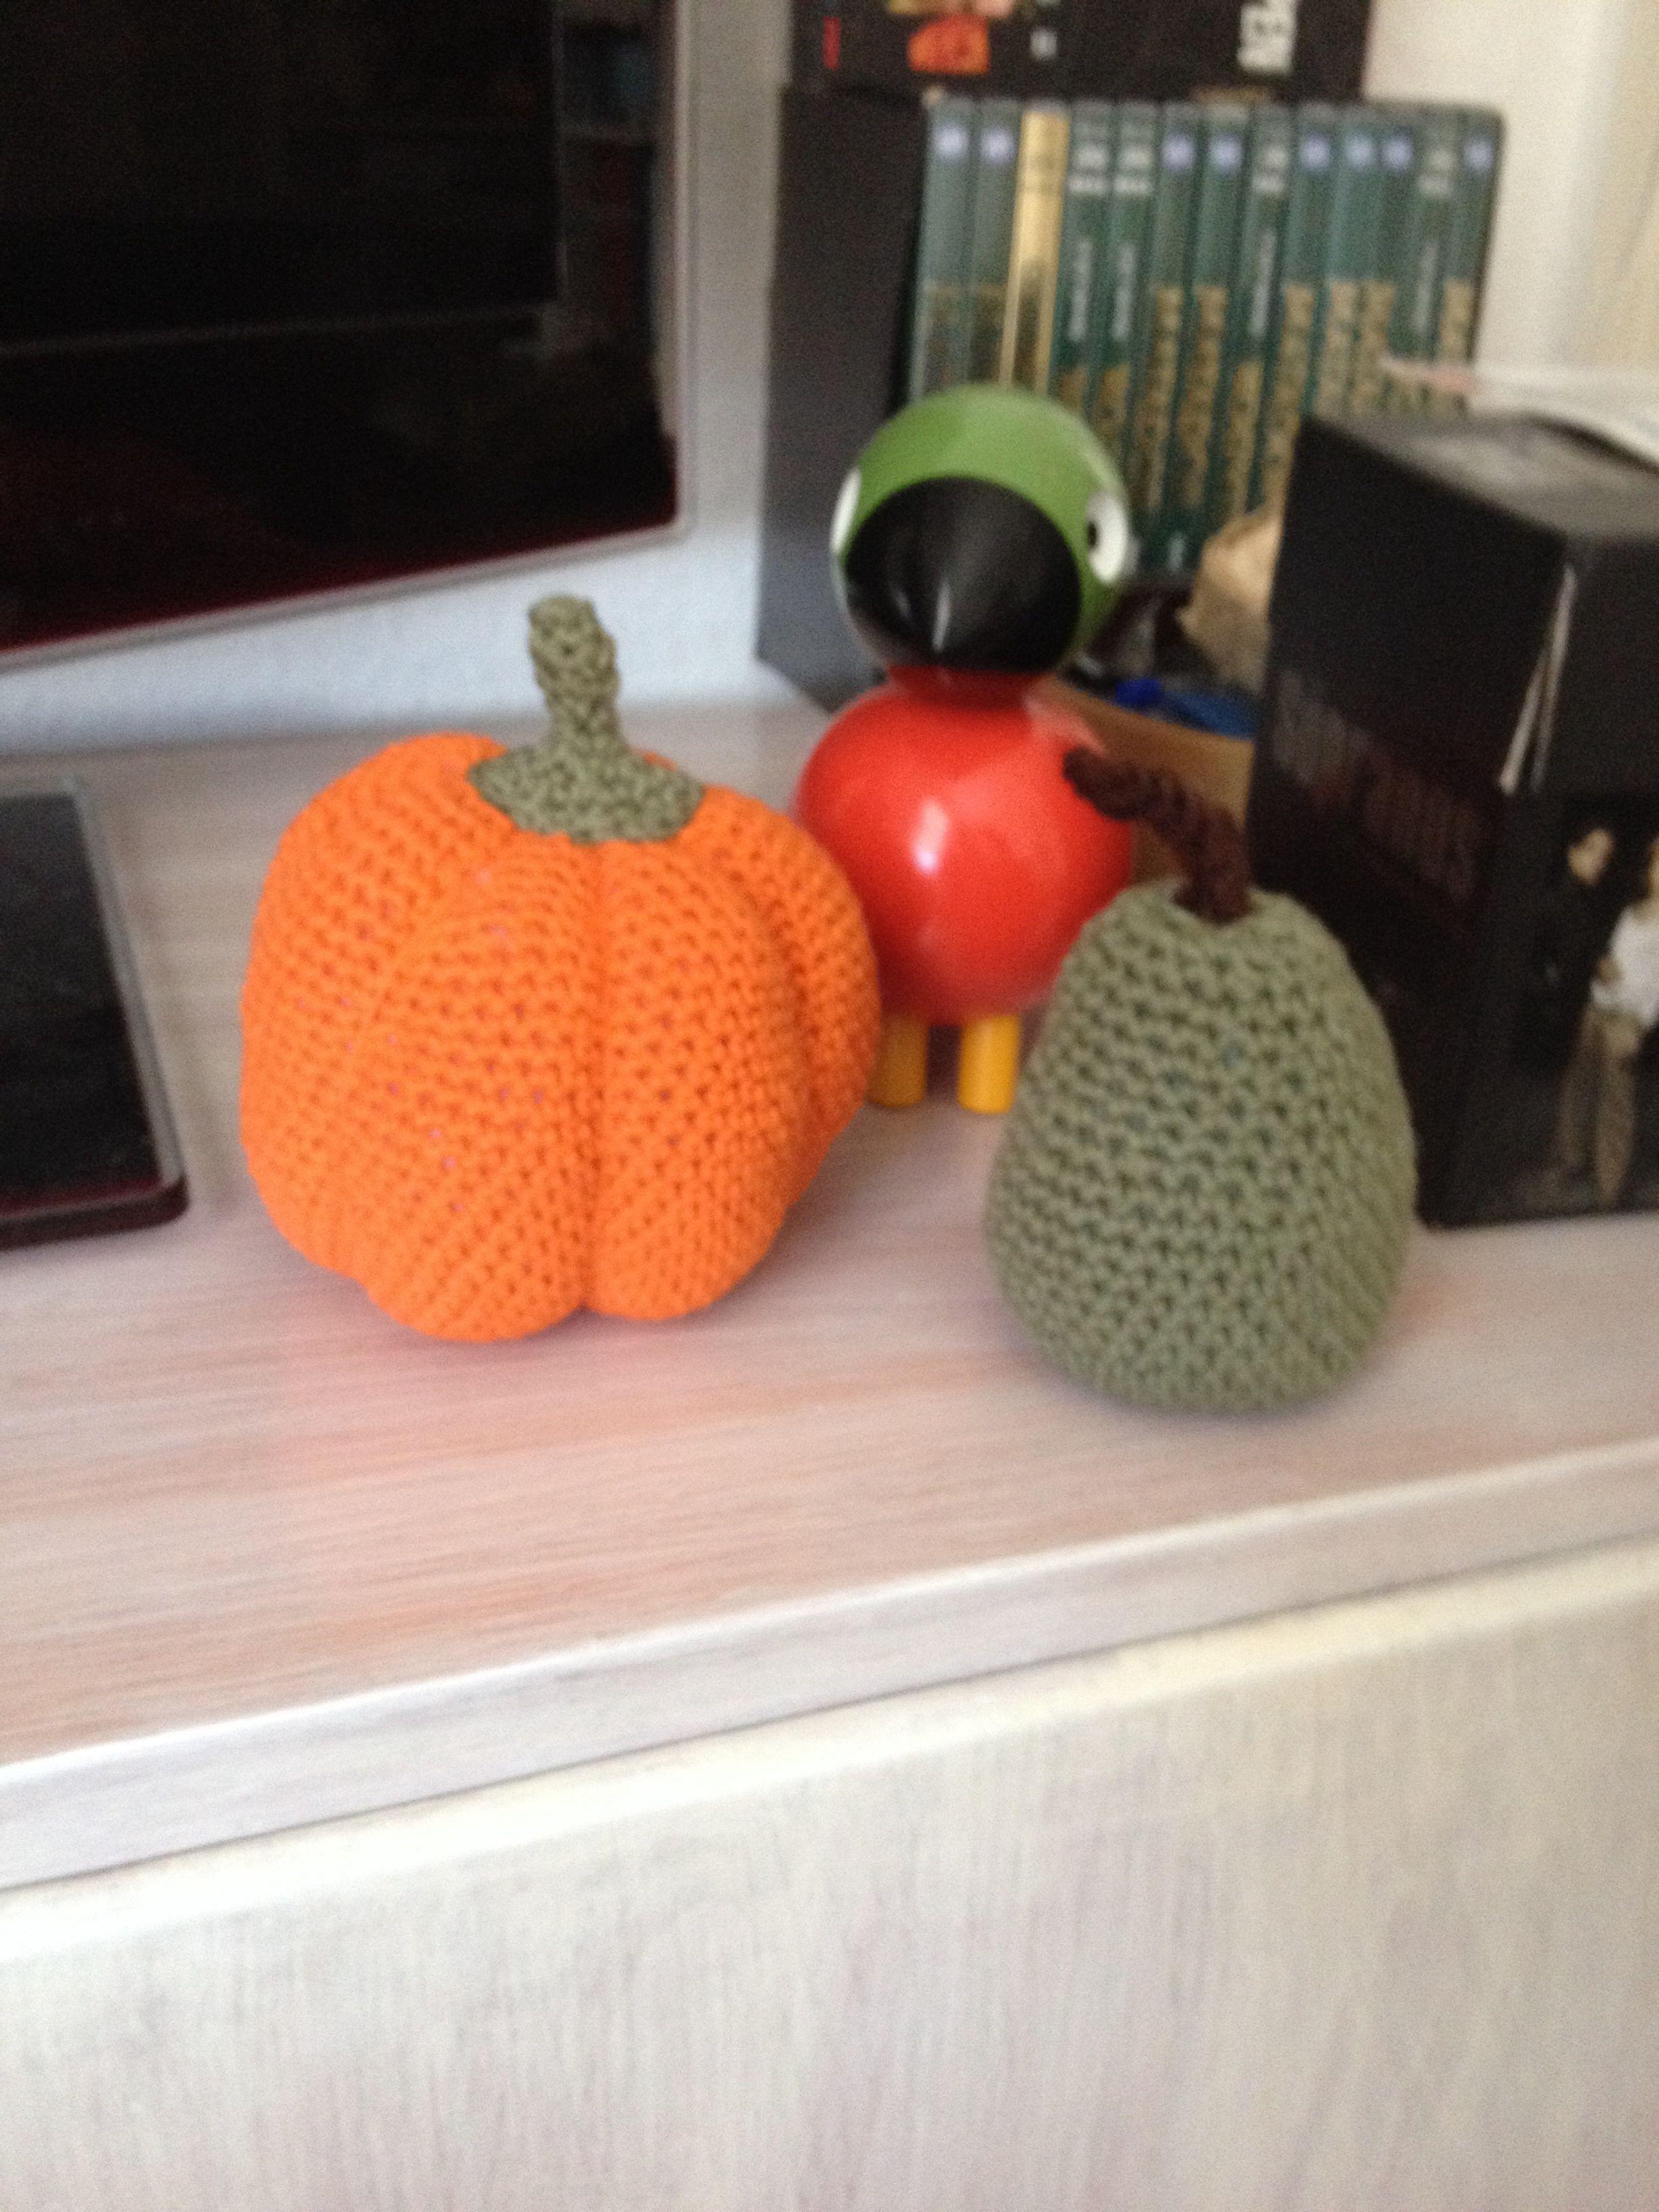 Hæklet græskar, æble og pære. Crochet apple and pear.